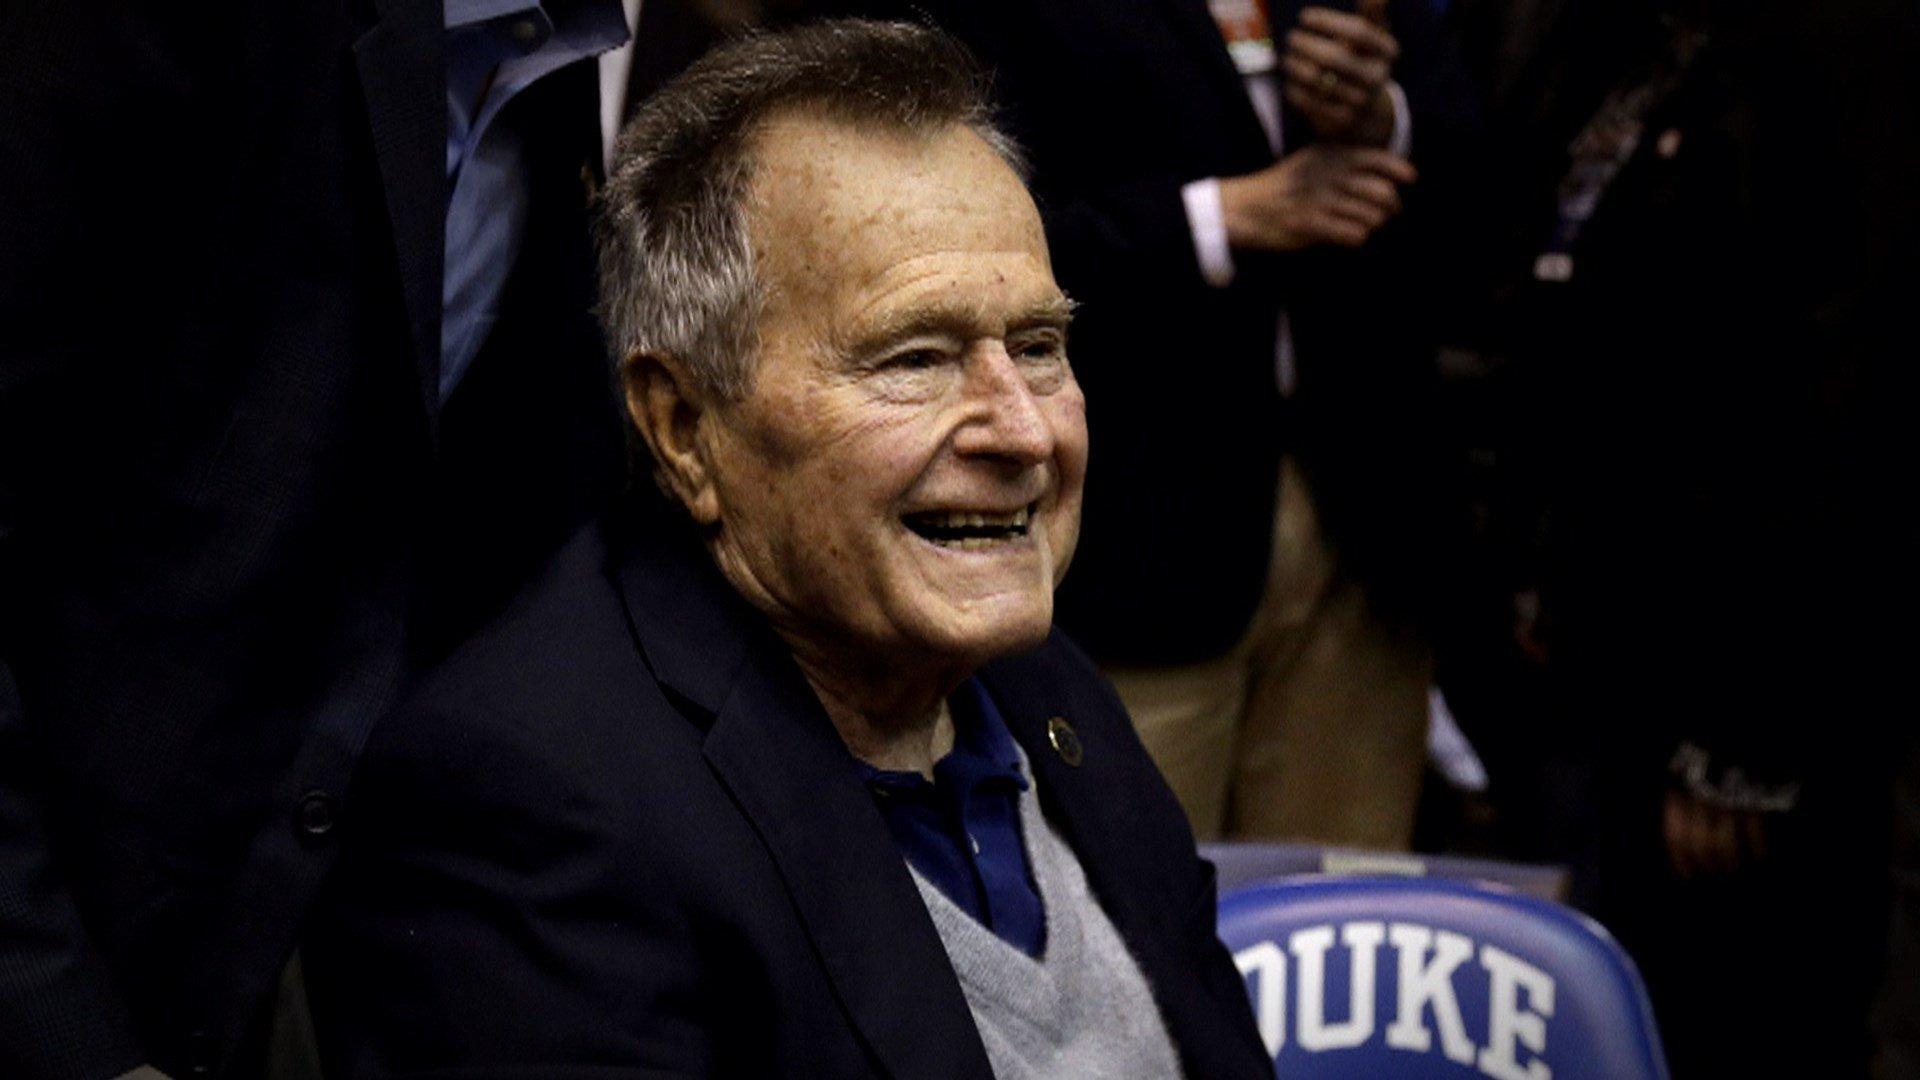 (Photo Courtesy NBC NEWS: George H.W. Bush